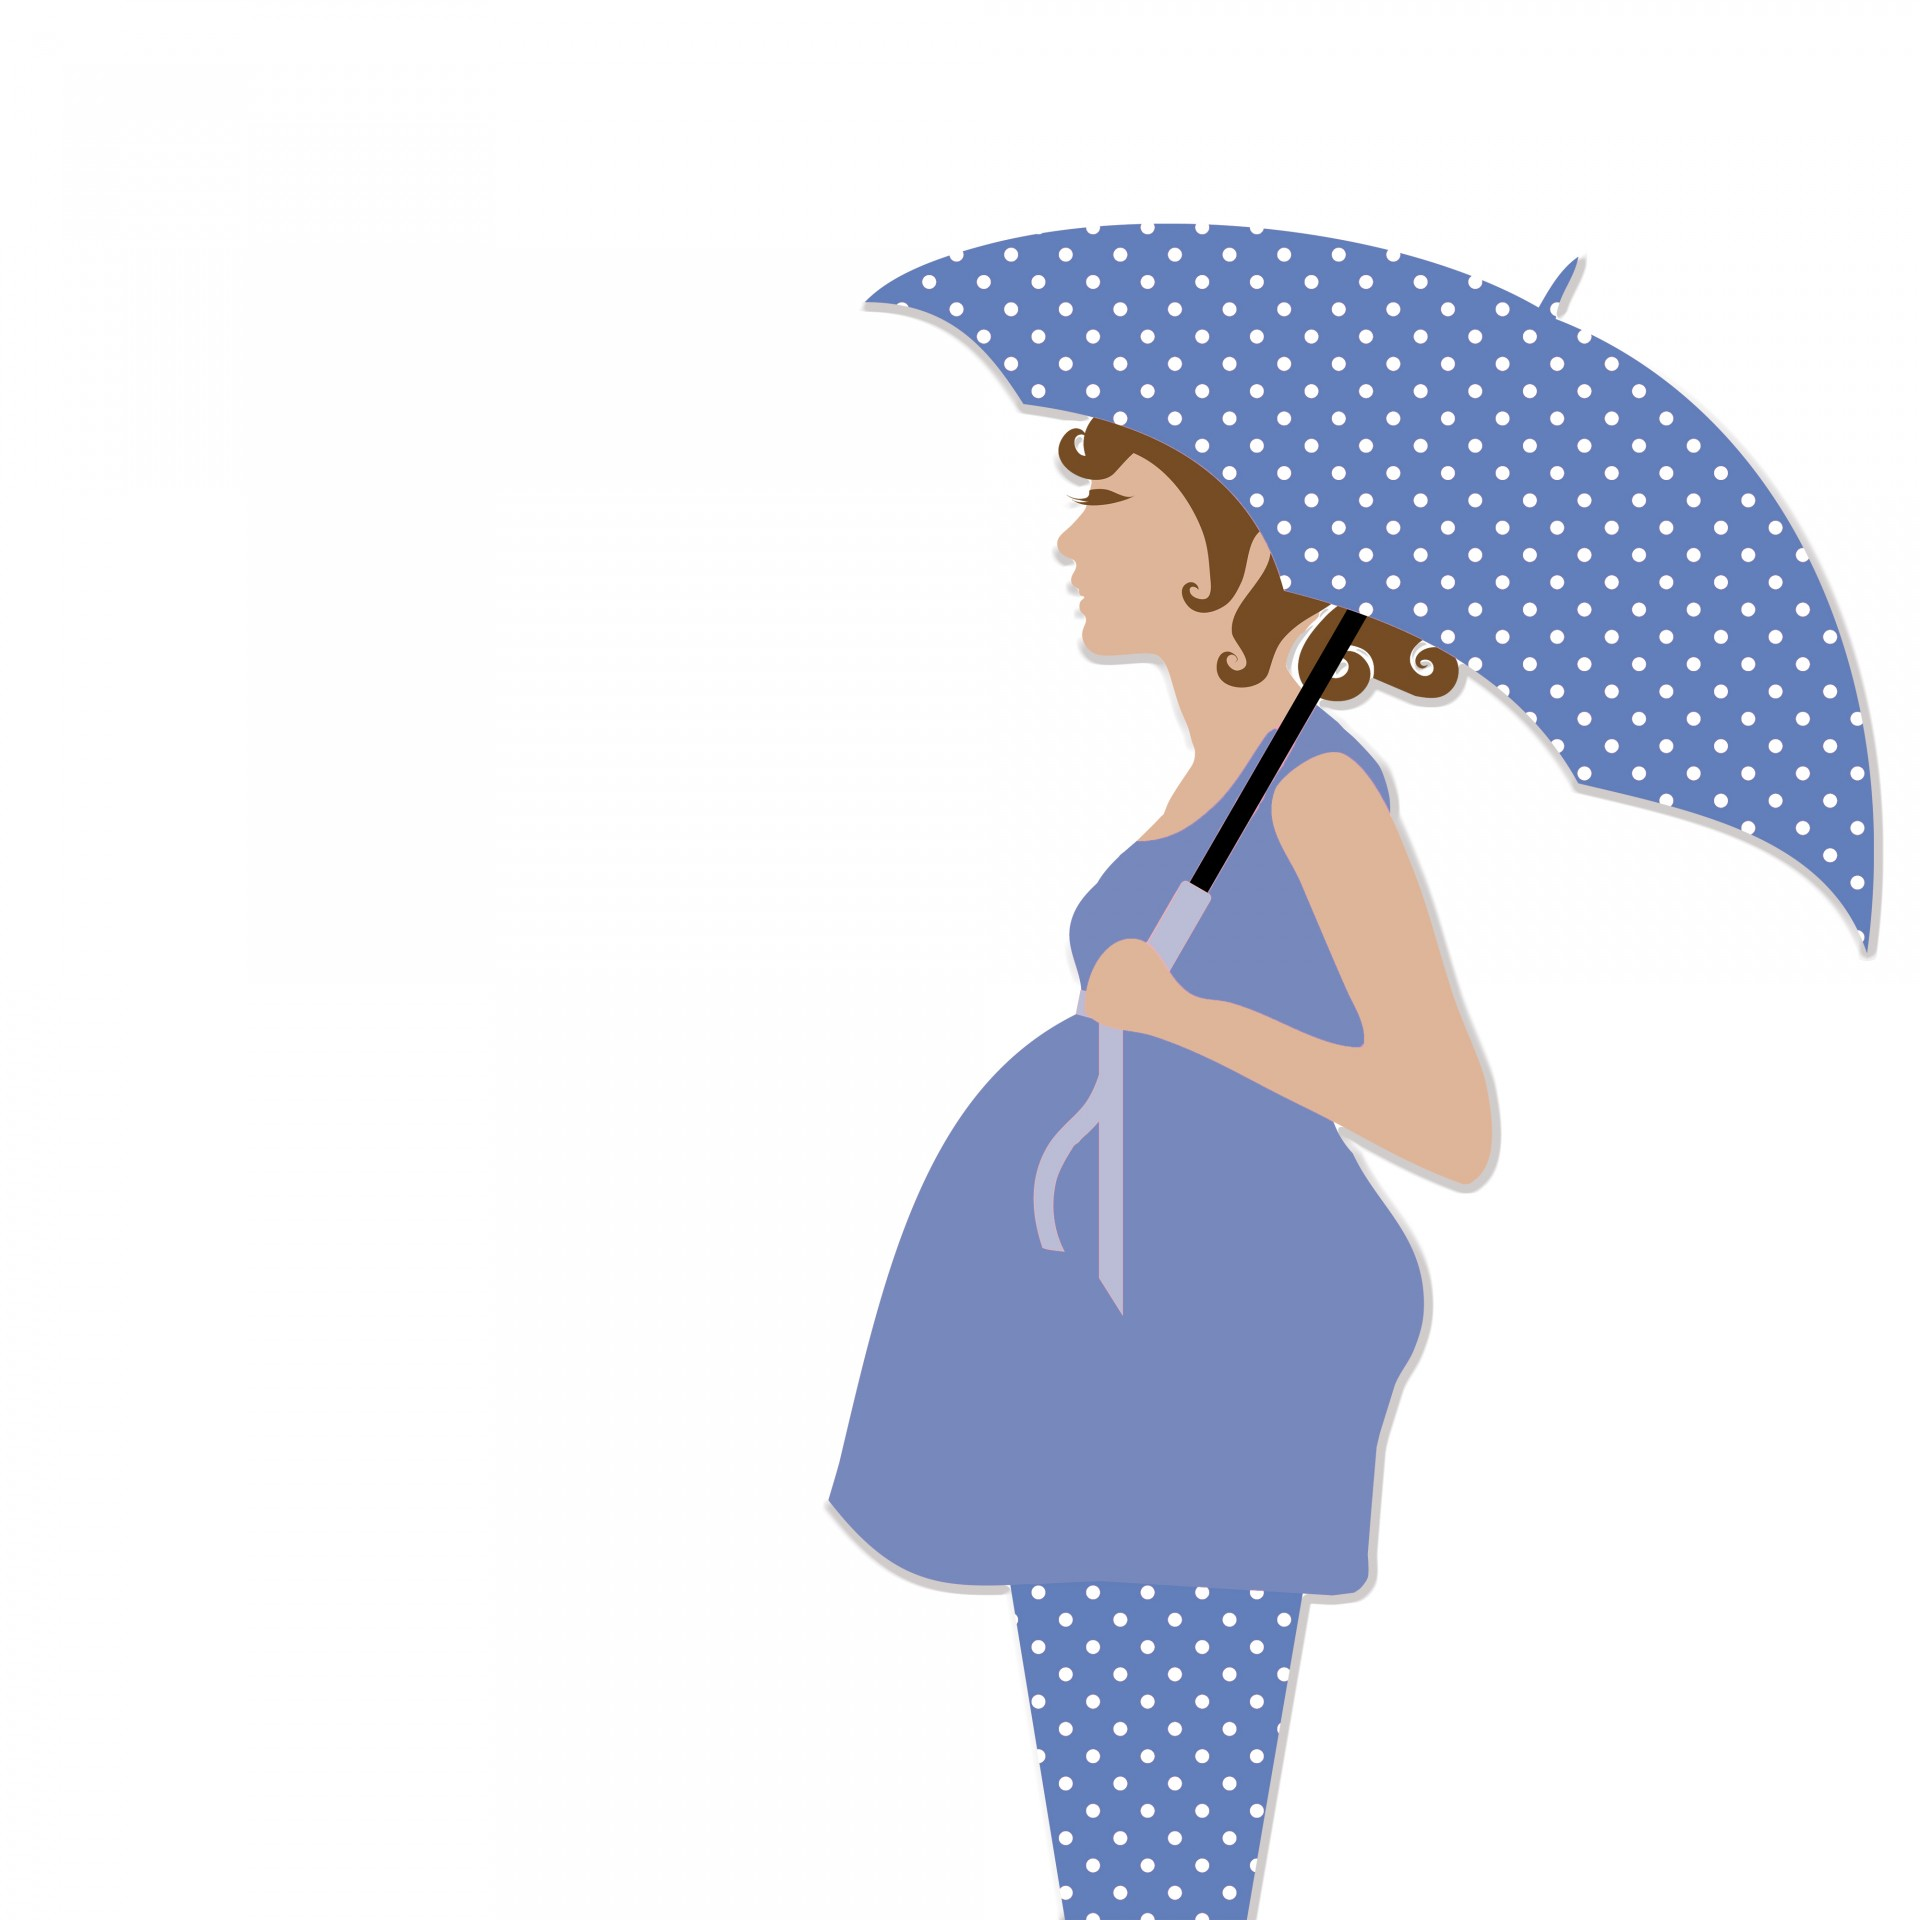 Schwangere Frau mit Regenschirm Kostenloses Stock Bild.